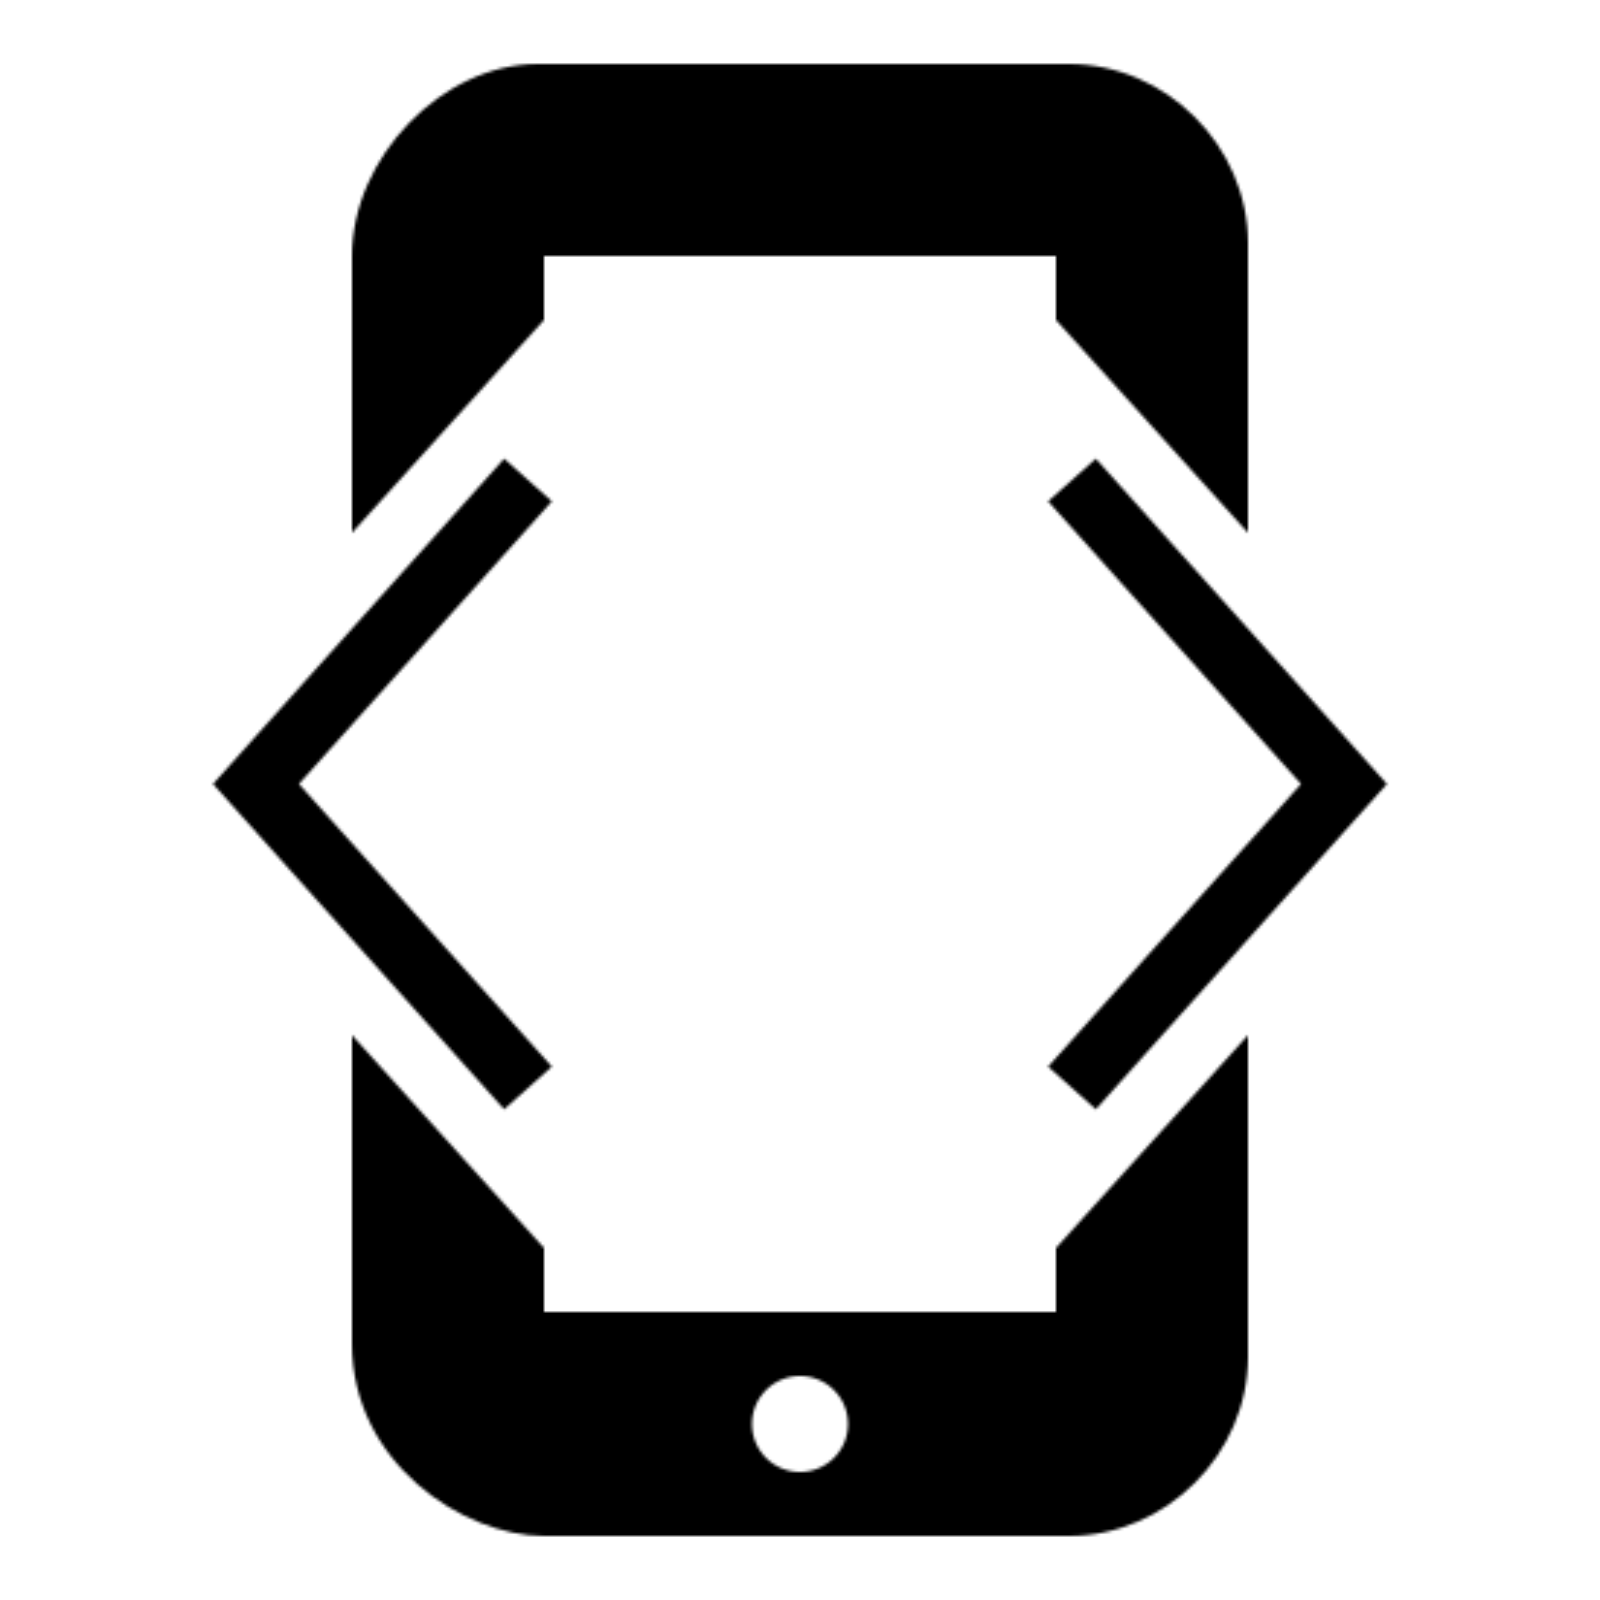 iOS Development Filled icon